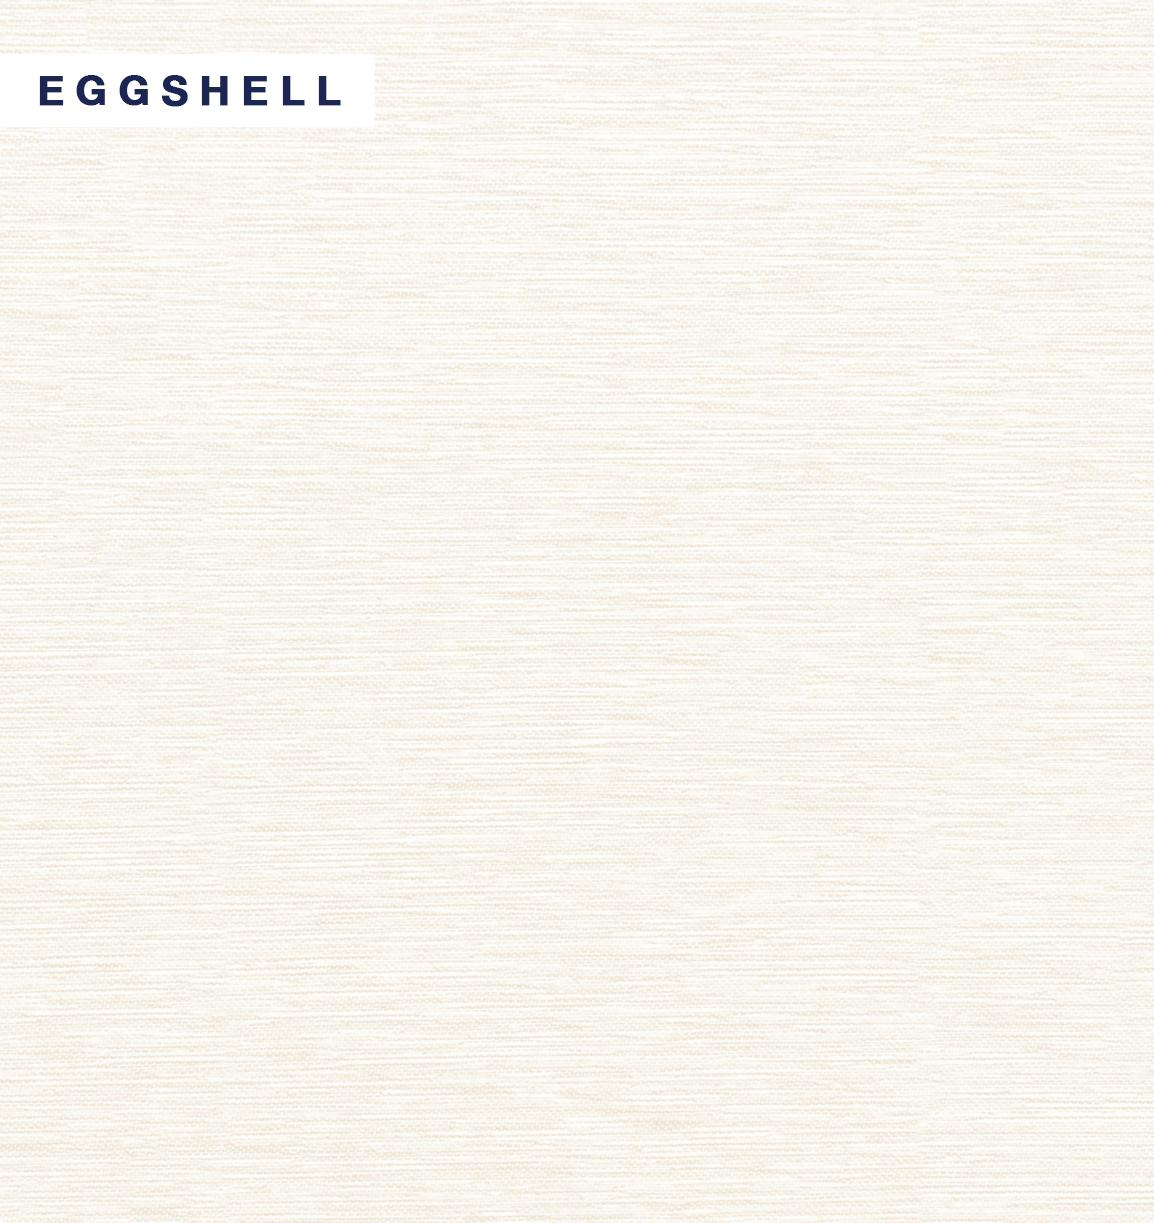 Zara - Eggshell.jpg